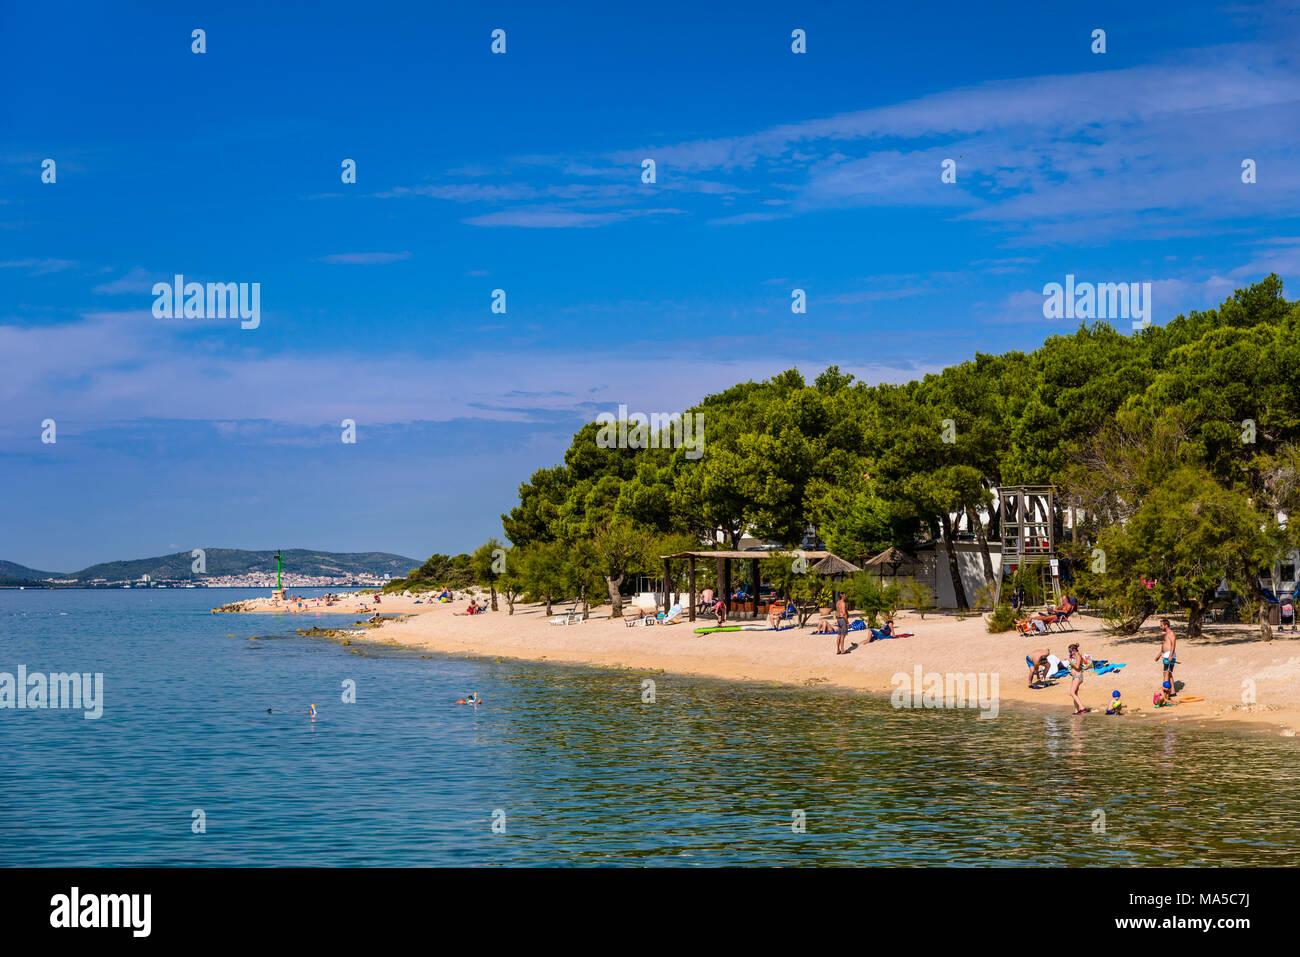 kroatien dalmatien sibenik solaris beach resort. Black Bedroom Furniture Sets. Home Design Ideas